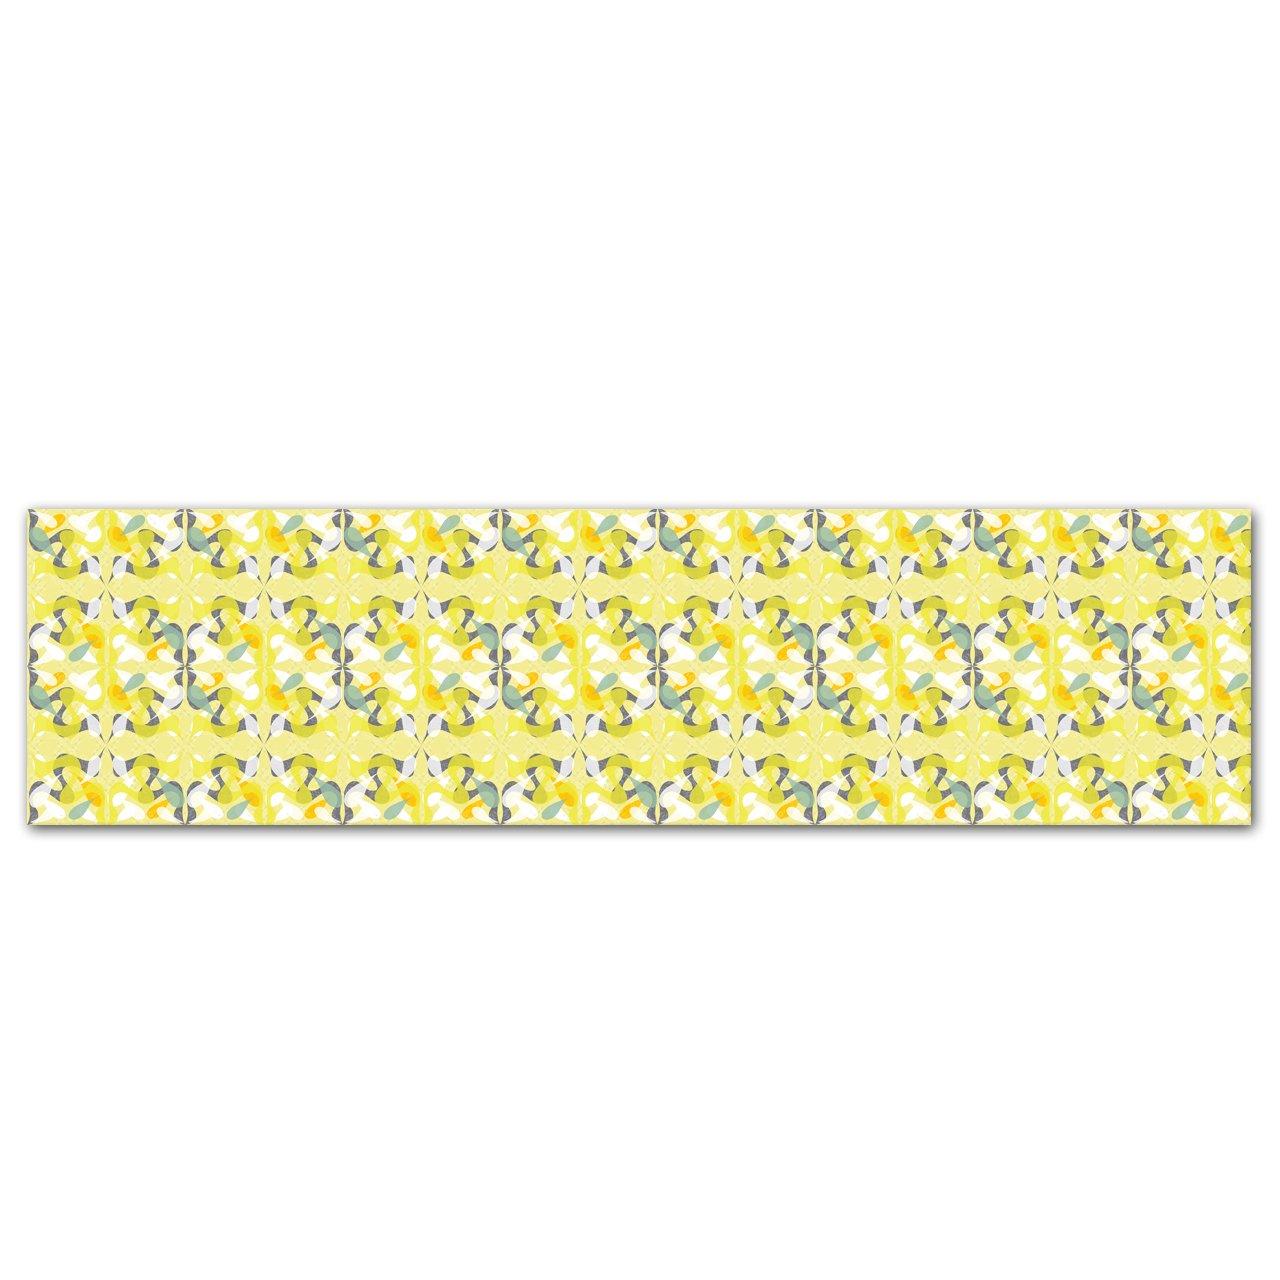 Kess InHouse MM4050AKP03 Miranda Mol Spring Flourish Art Clings 6.5-Inch x 9-Feet Strip Sticker Wallpaper Decal